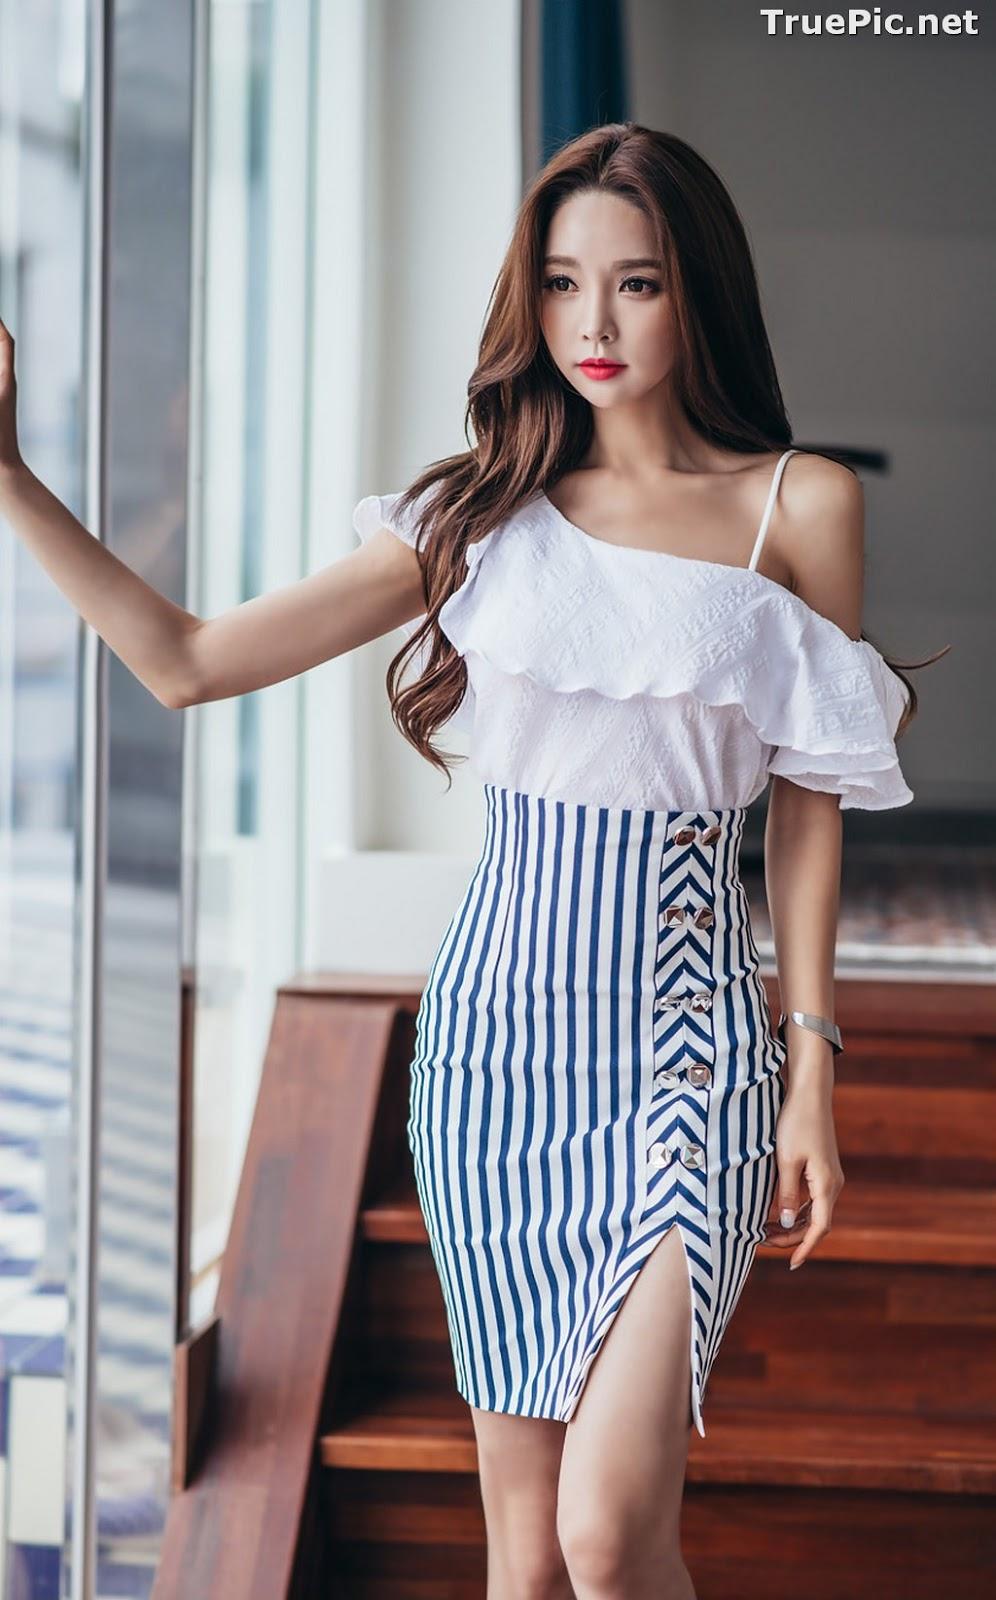 Image Korean Beautiful Model – Park Soo Yeon – Fashion Photography #2 - TruePic.net - Picture-6